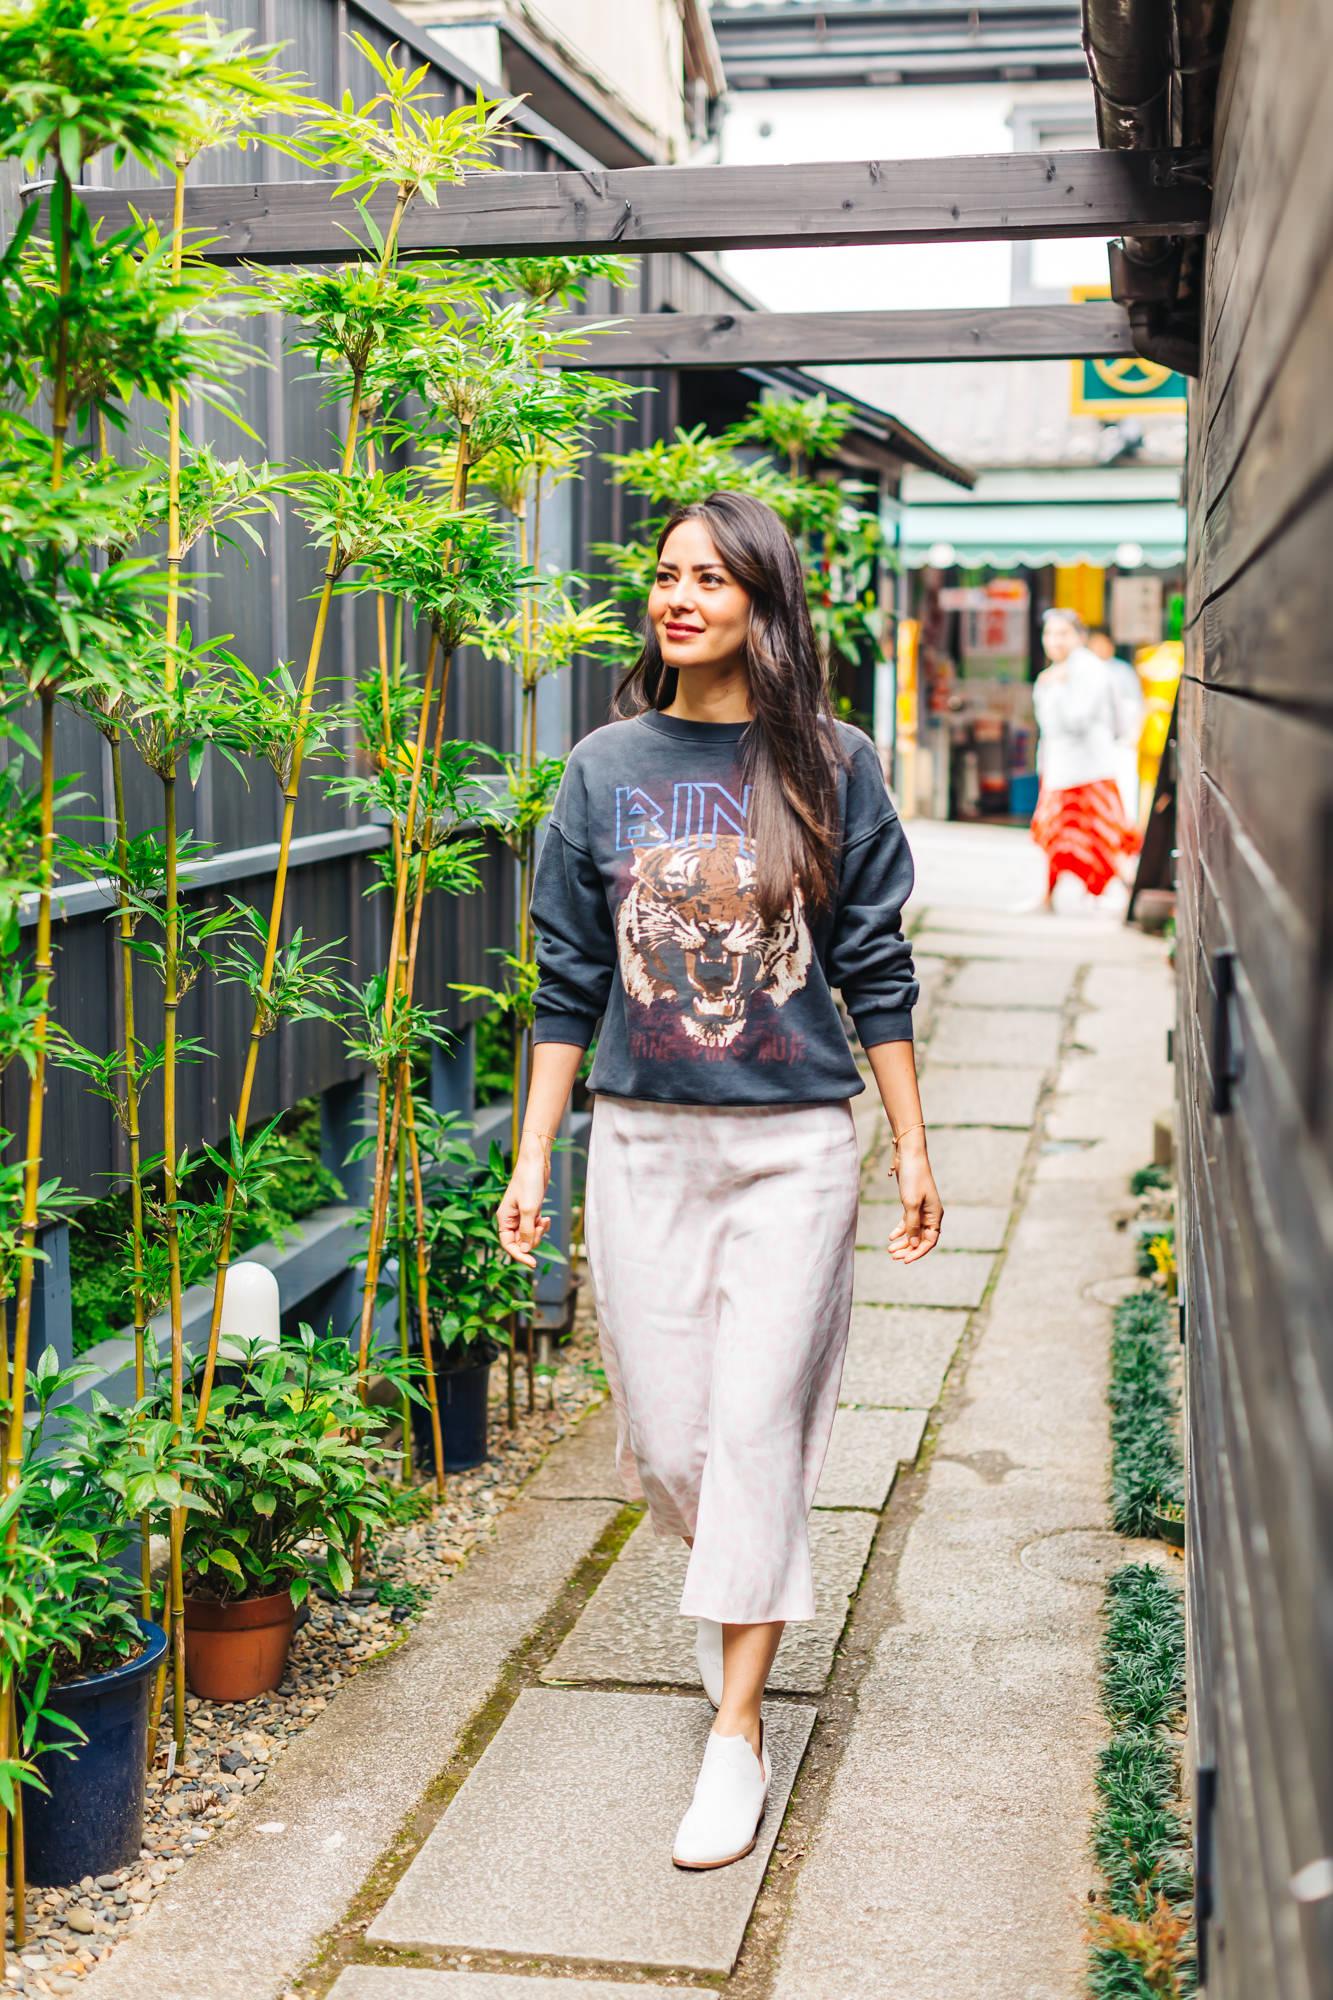 Anine Bing   Sweatshirt   | AFRM   Skirt     | Seychelles     Booties